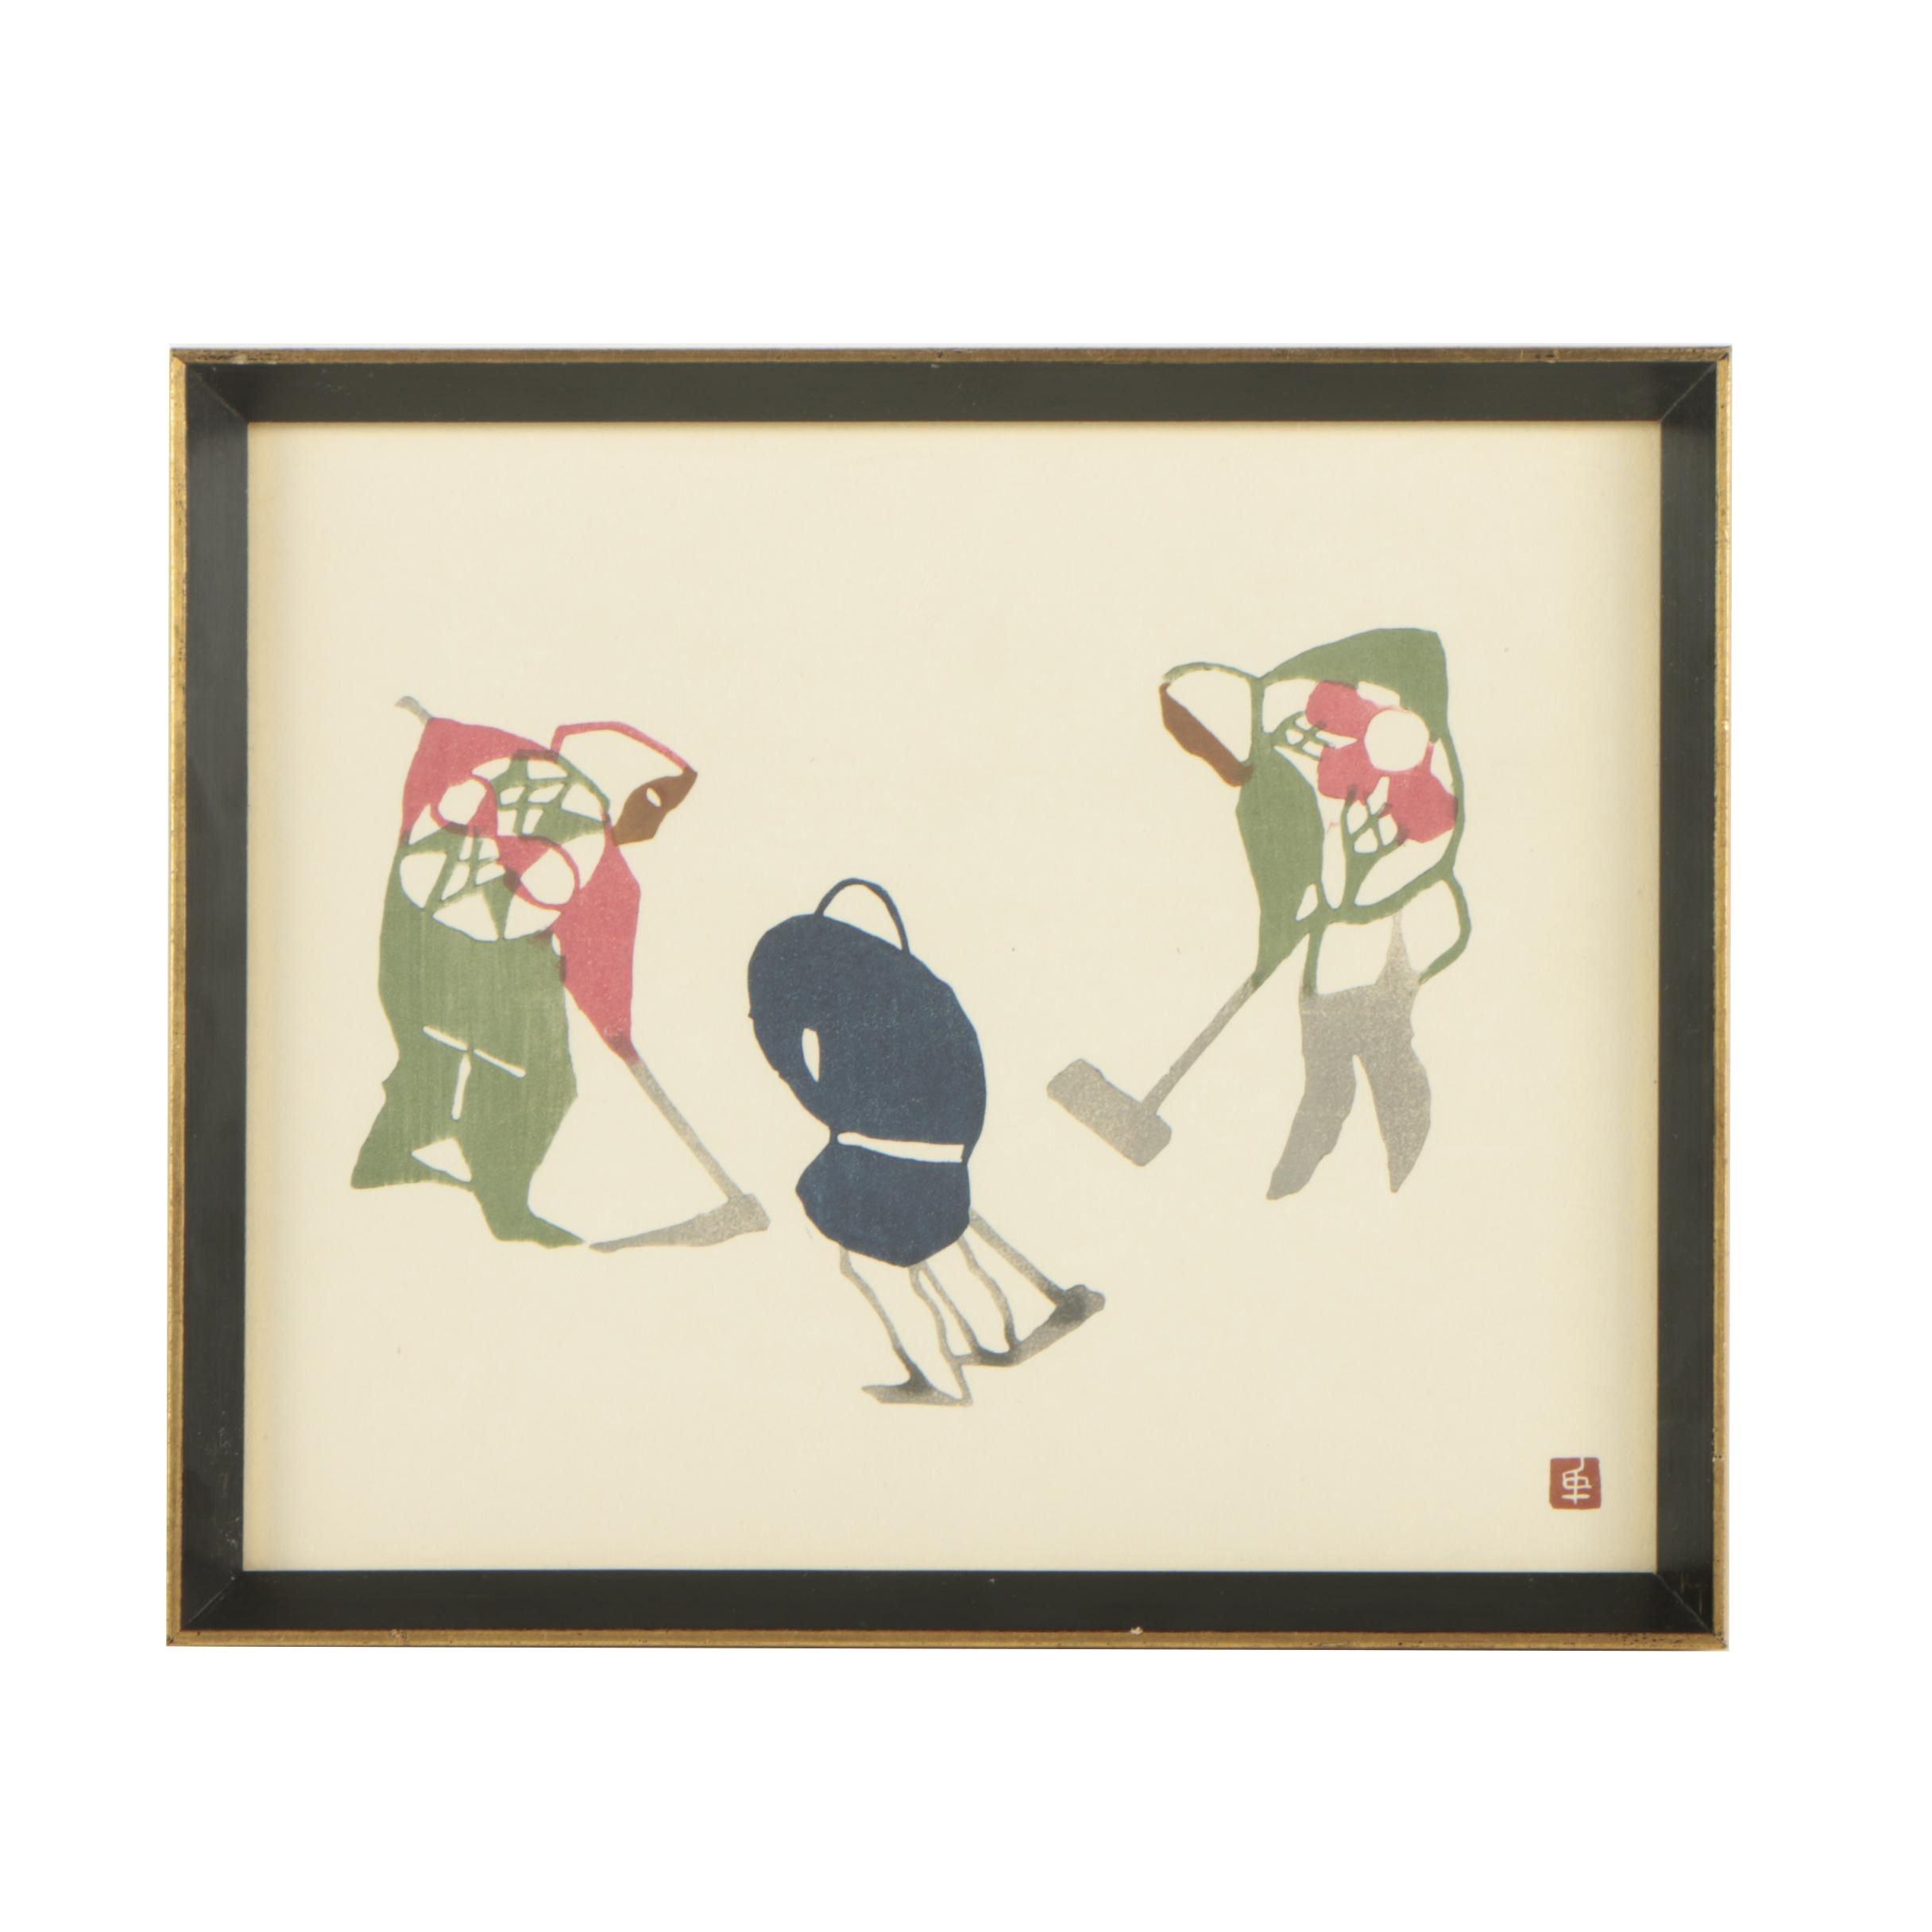 Mikumo Ishihara Japanese Woodblock Print